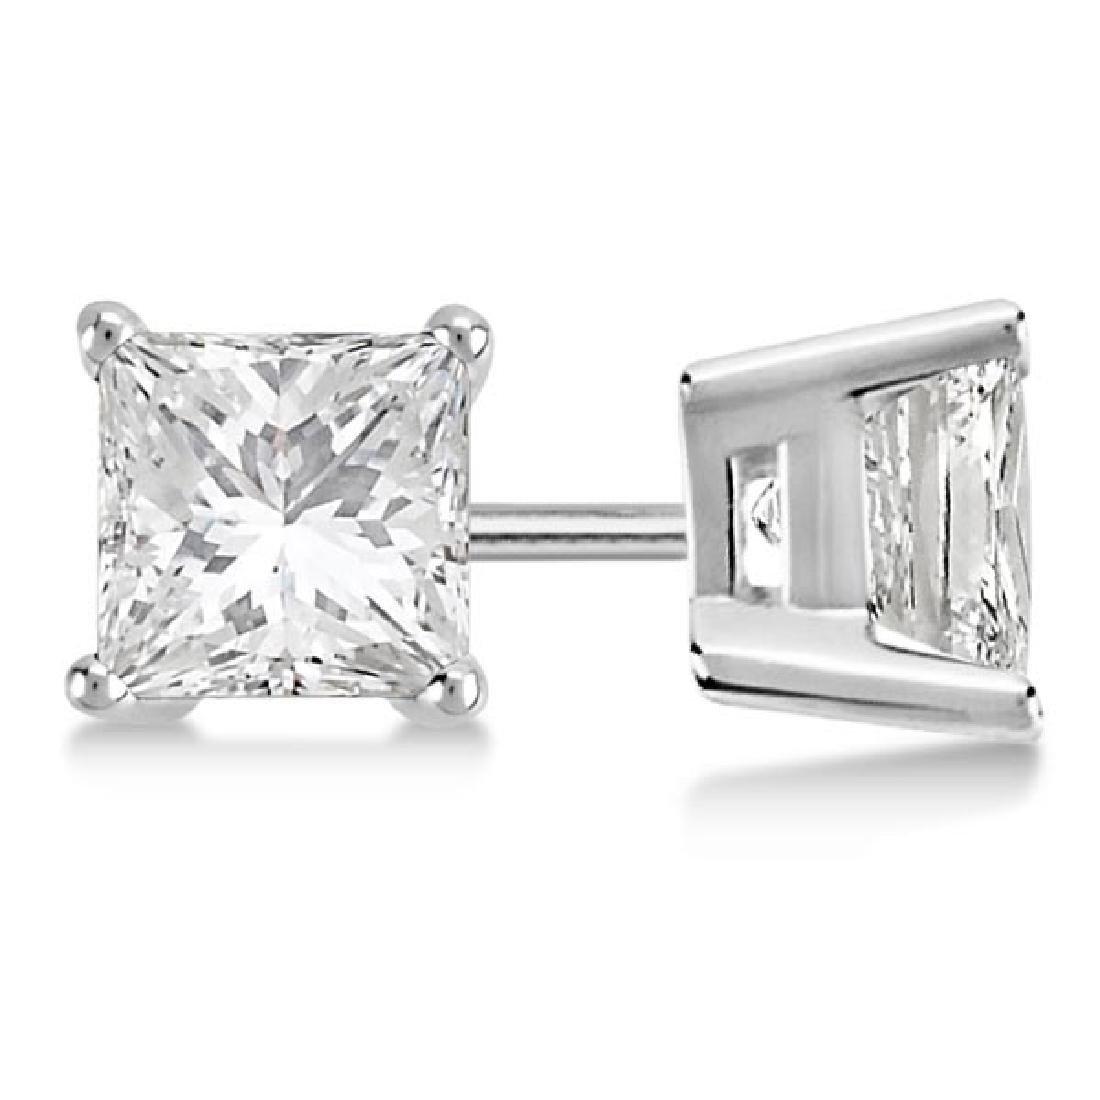 Certified 1.01 CTW Princess Diamond Stud Earrings D/SI2